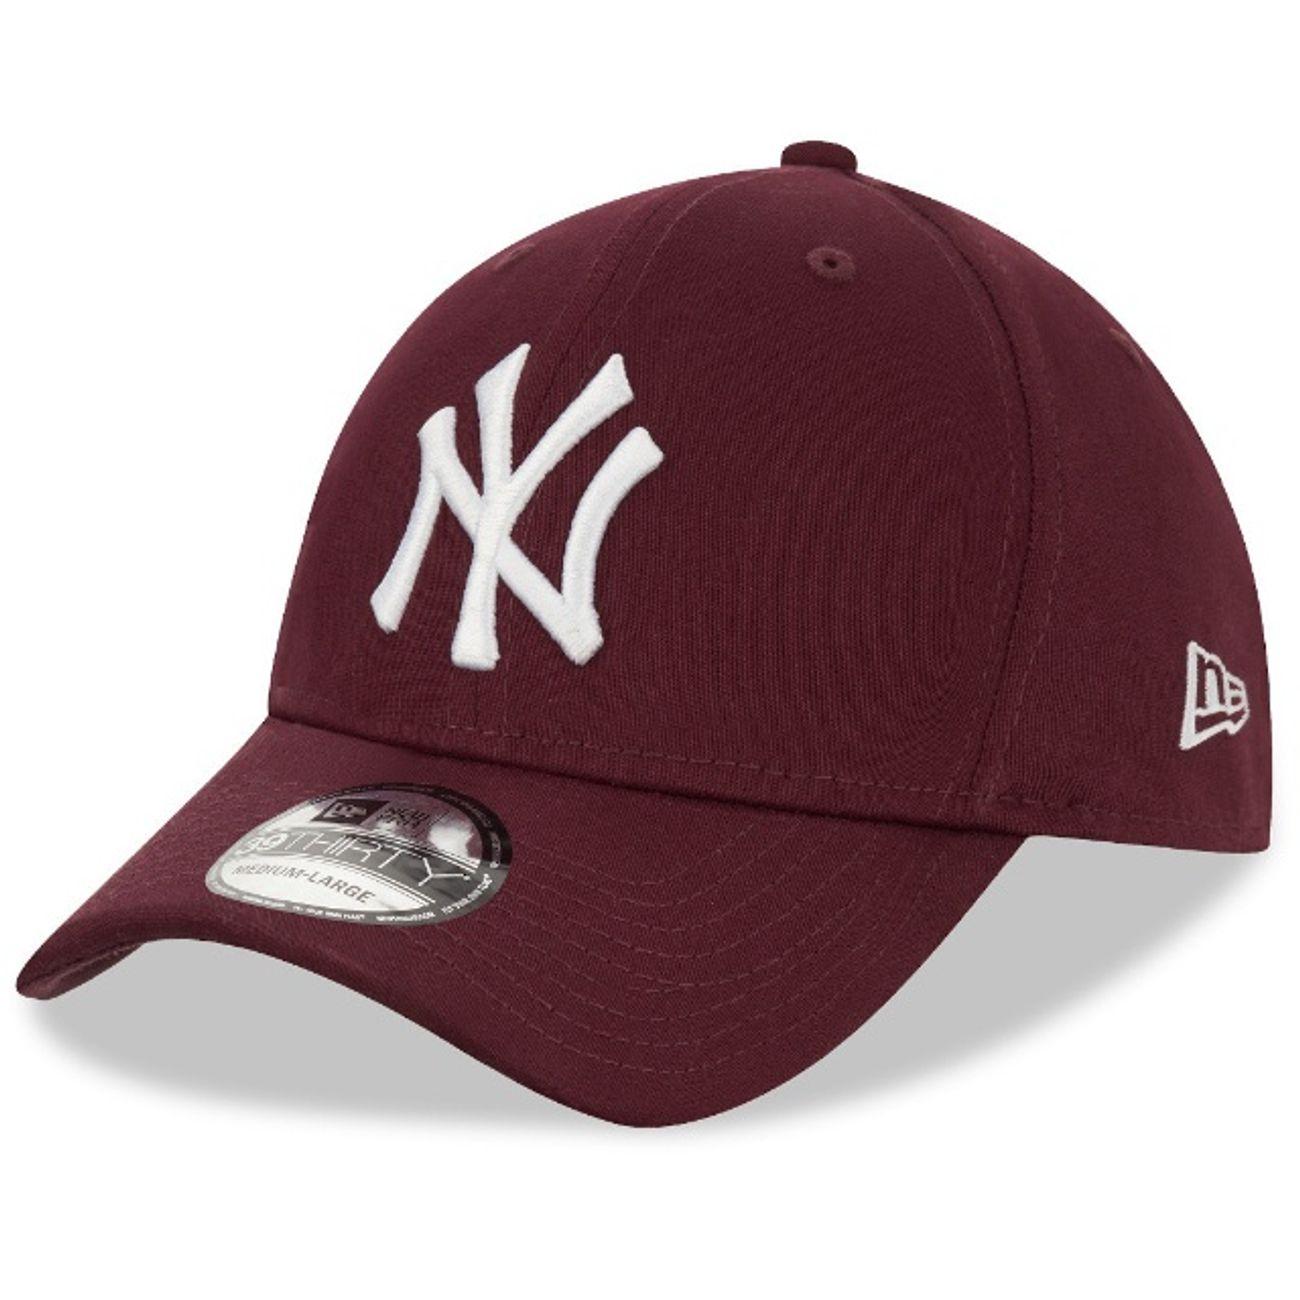 Baseball homme NEW ERA Casquette New Era Yankees League Essential 39thirty